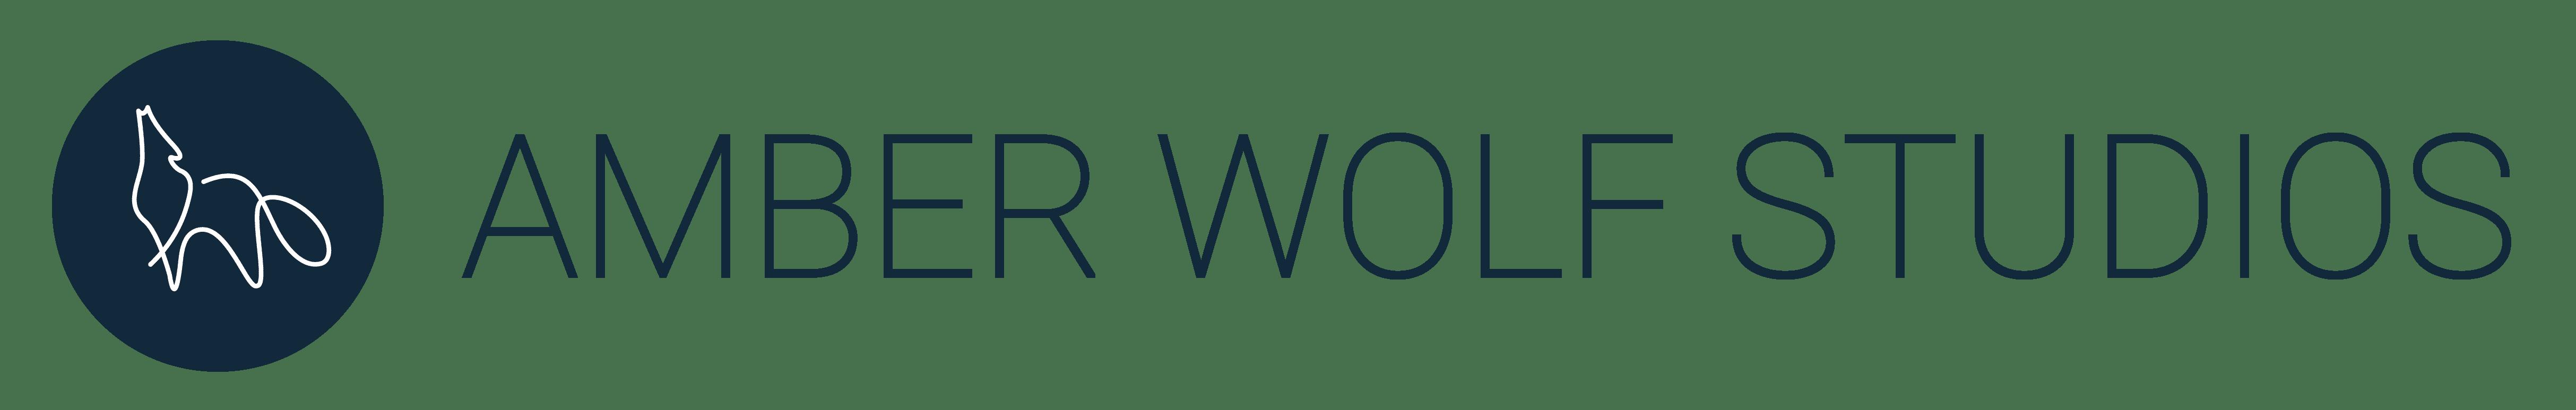 Amber Wolf Studios